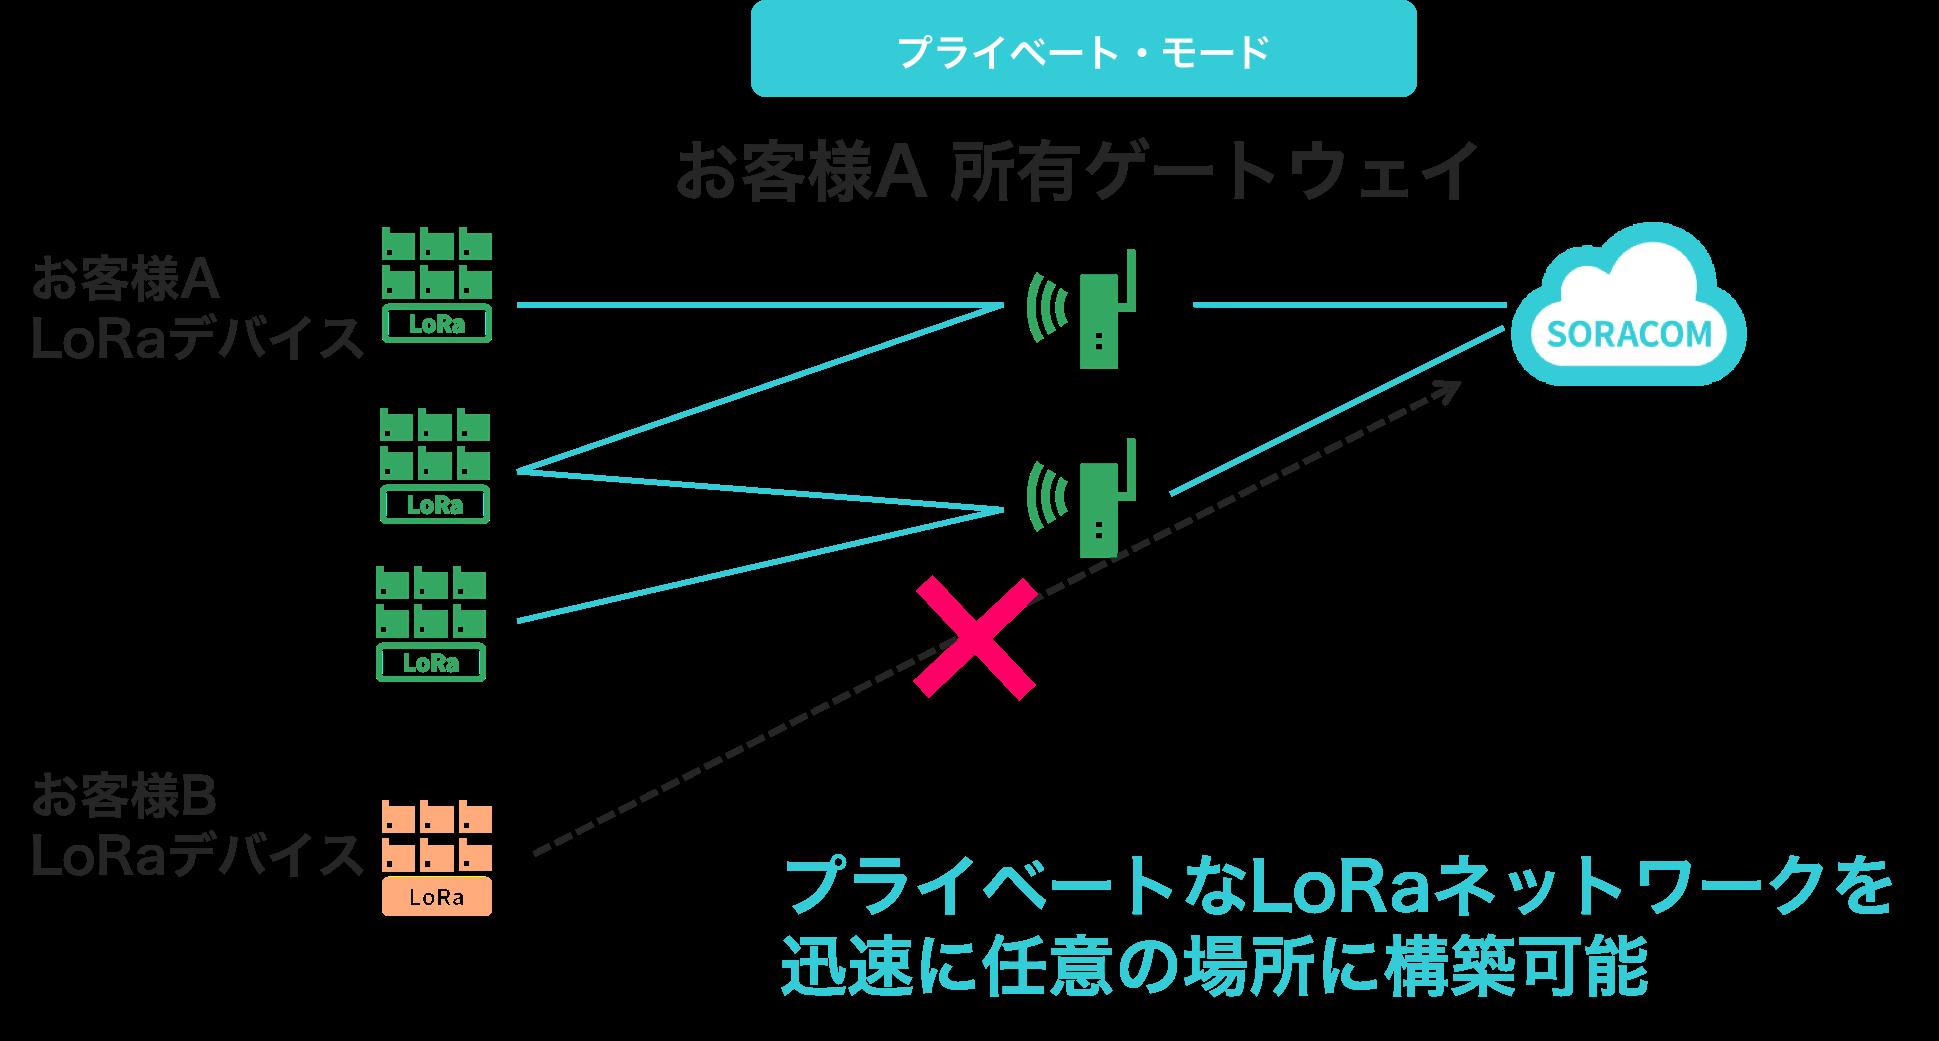 SORACOM Air for LoRaWAN ゲートウェイ プライベート・モード